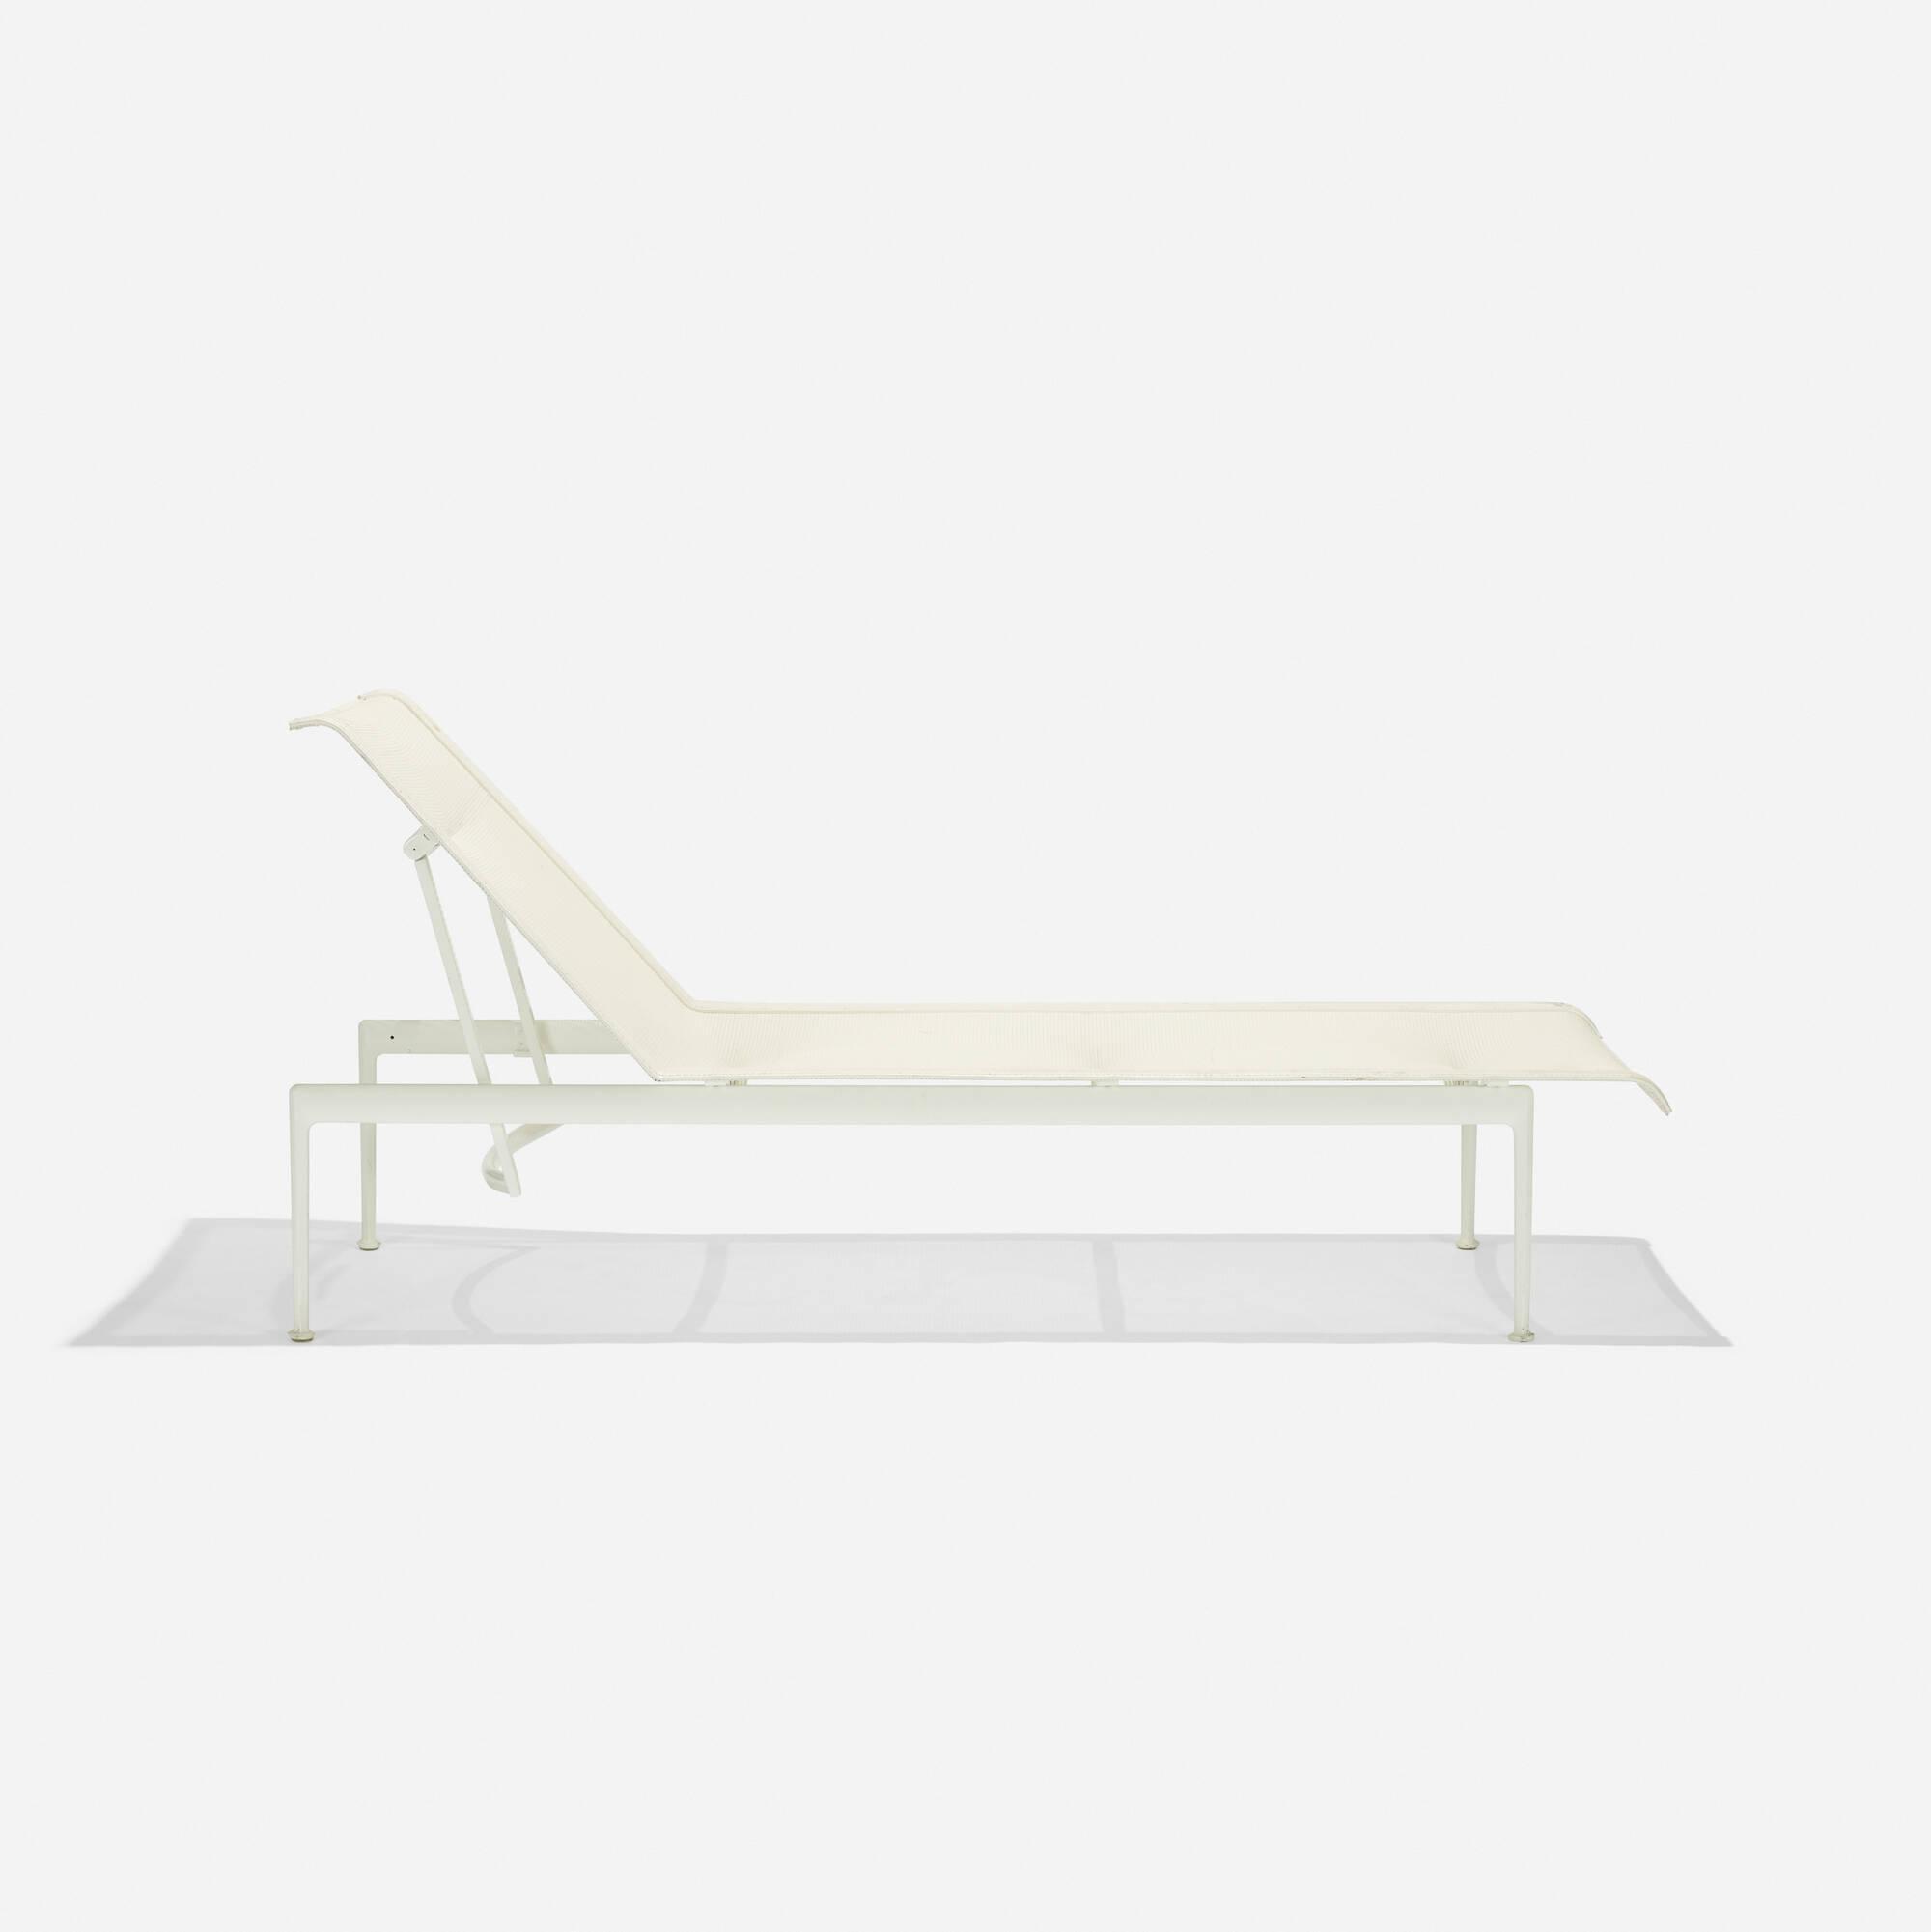 richard schultz  prototype  chaise lounge  the design  -   richard schultz  prototype  chaise lounge ( of )